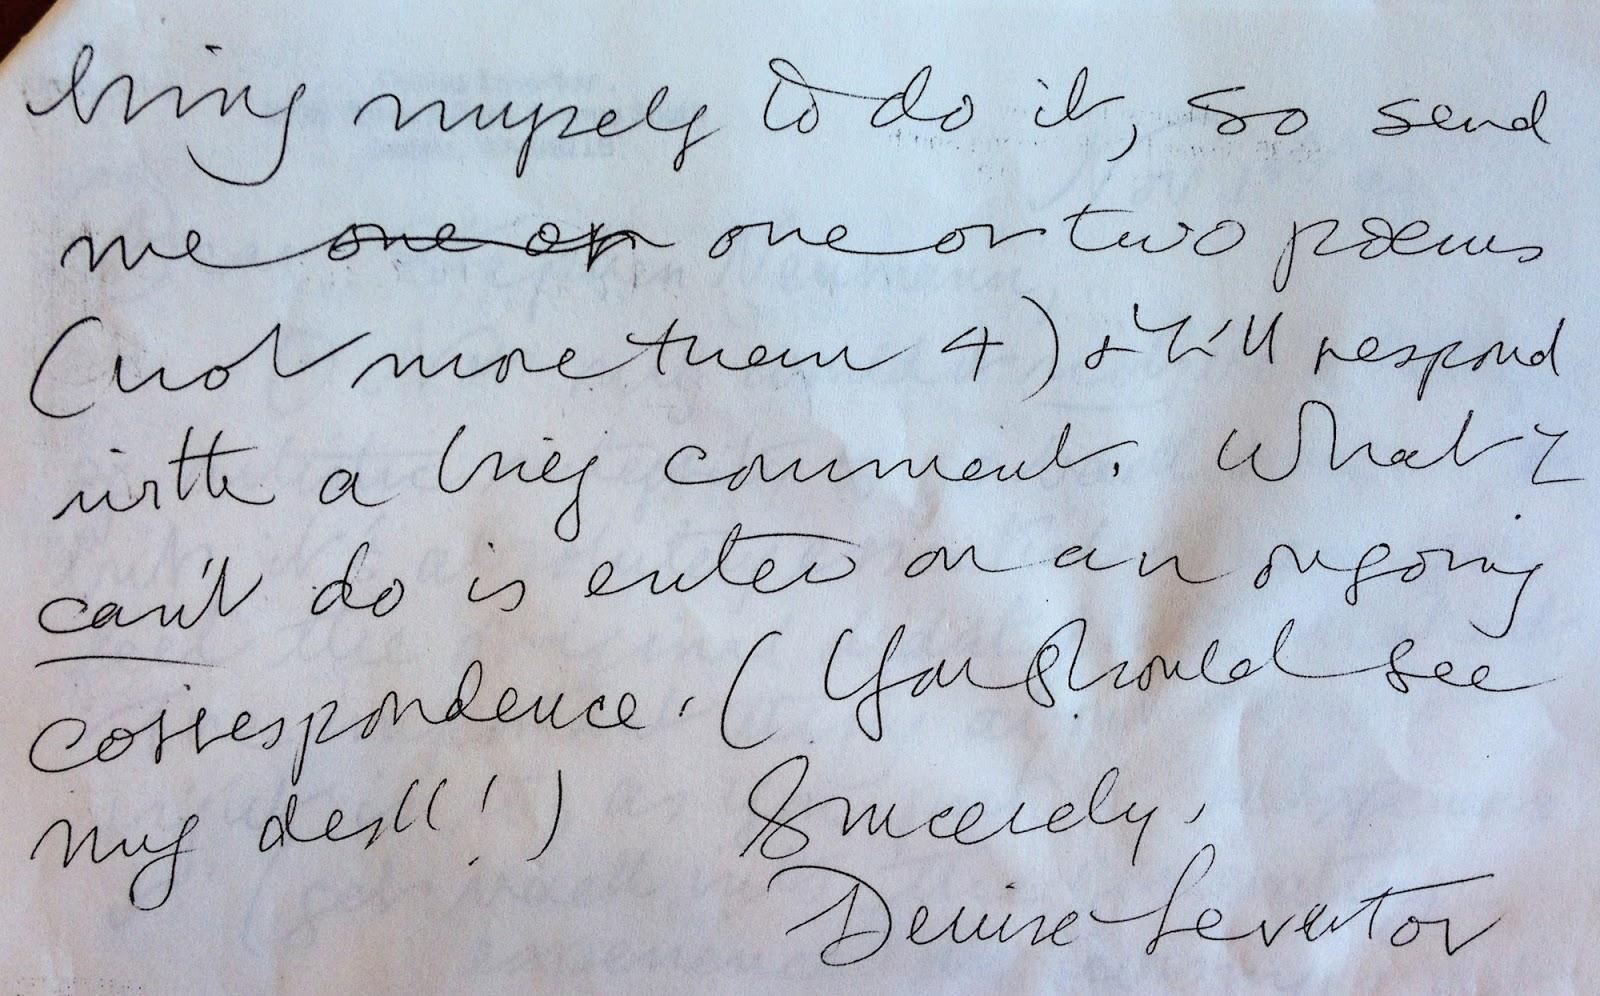 Letter from Levertov (via author)